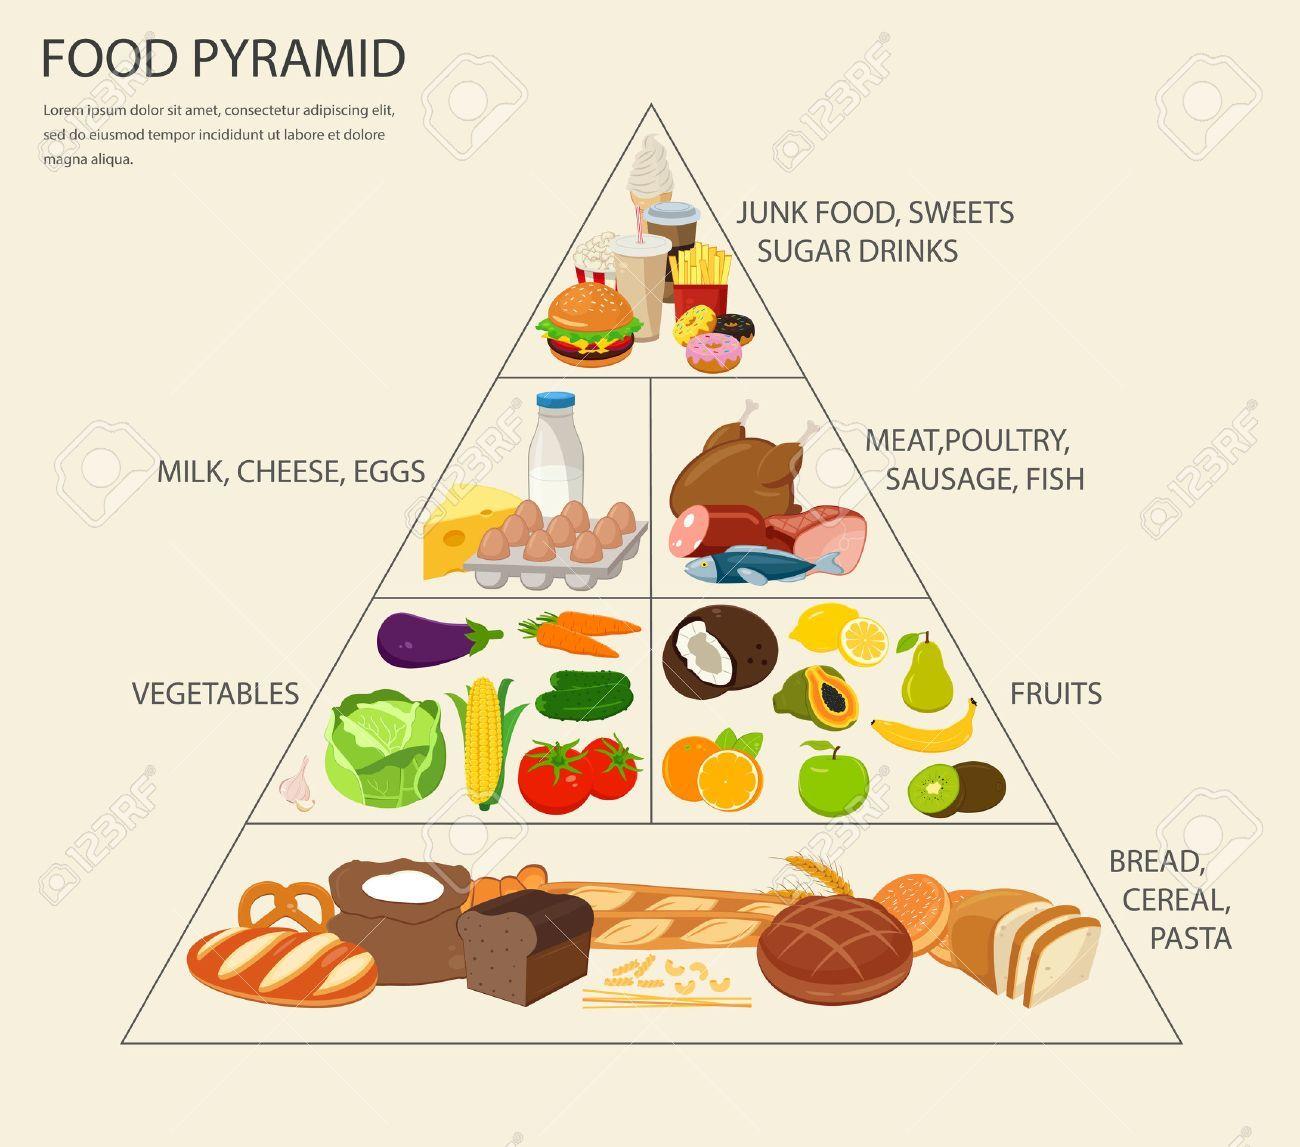 Food Pyramid Healthy Eating Infographic Healthy Lifestyle Icons Food Pyramid Healthy Food Logo Food Cartoon [ 1147 x 1300 Pixel ]